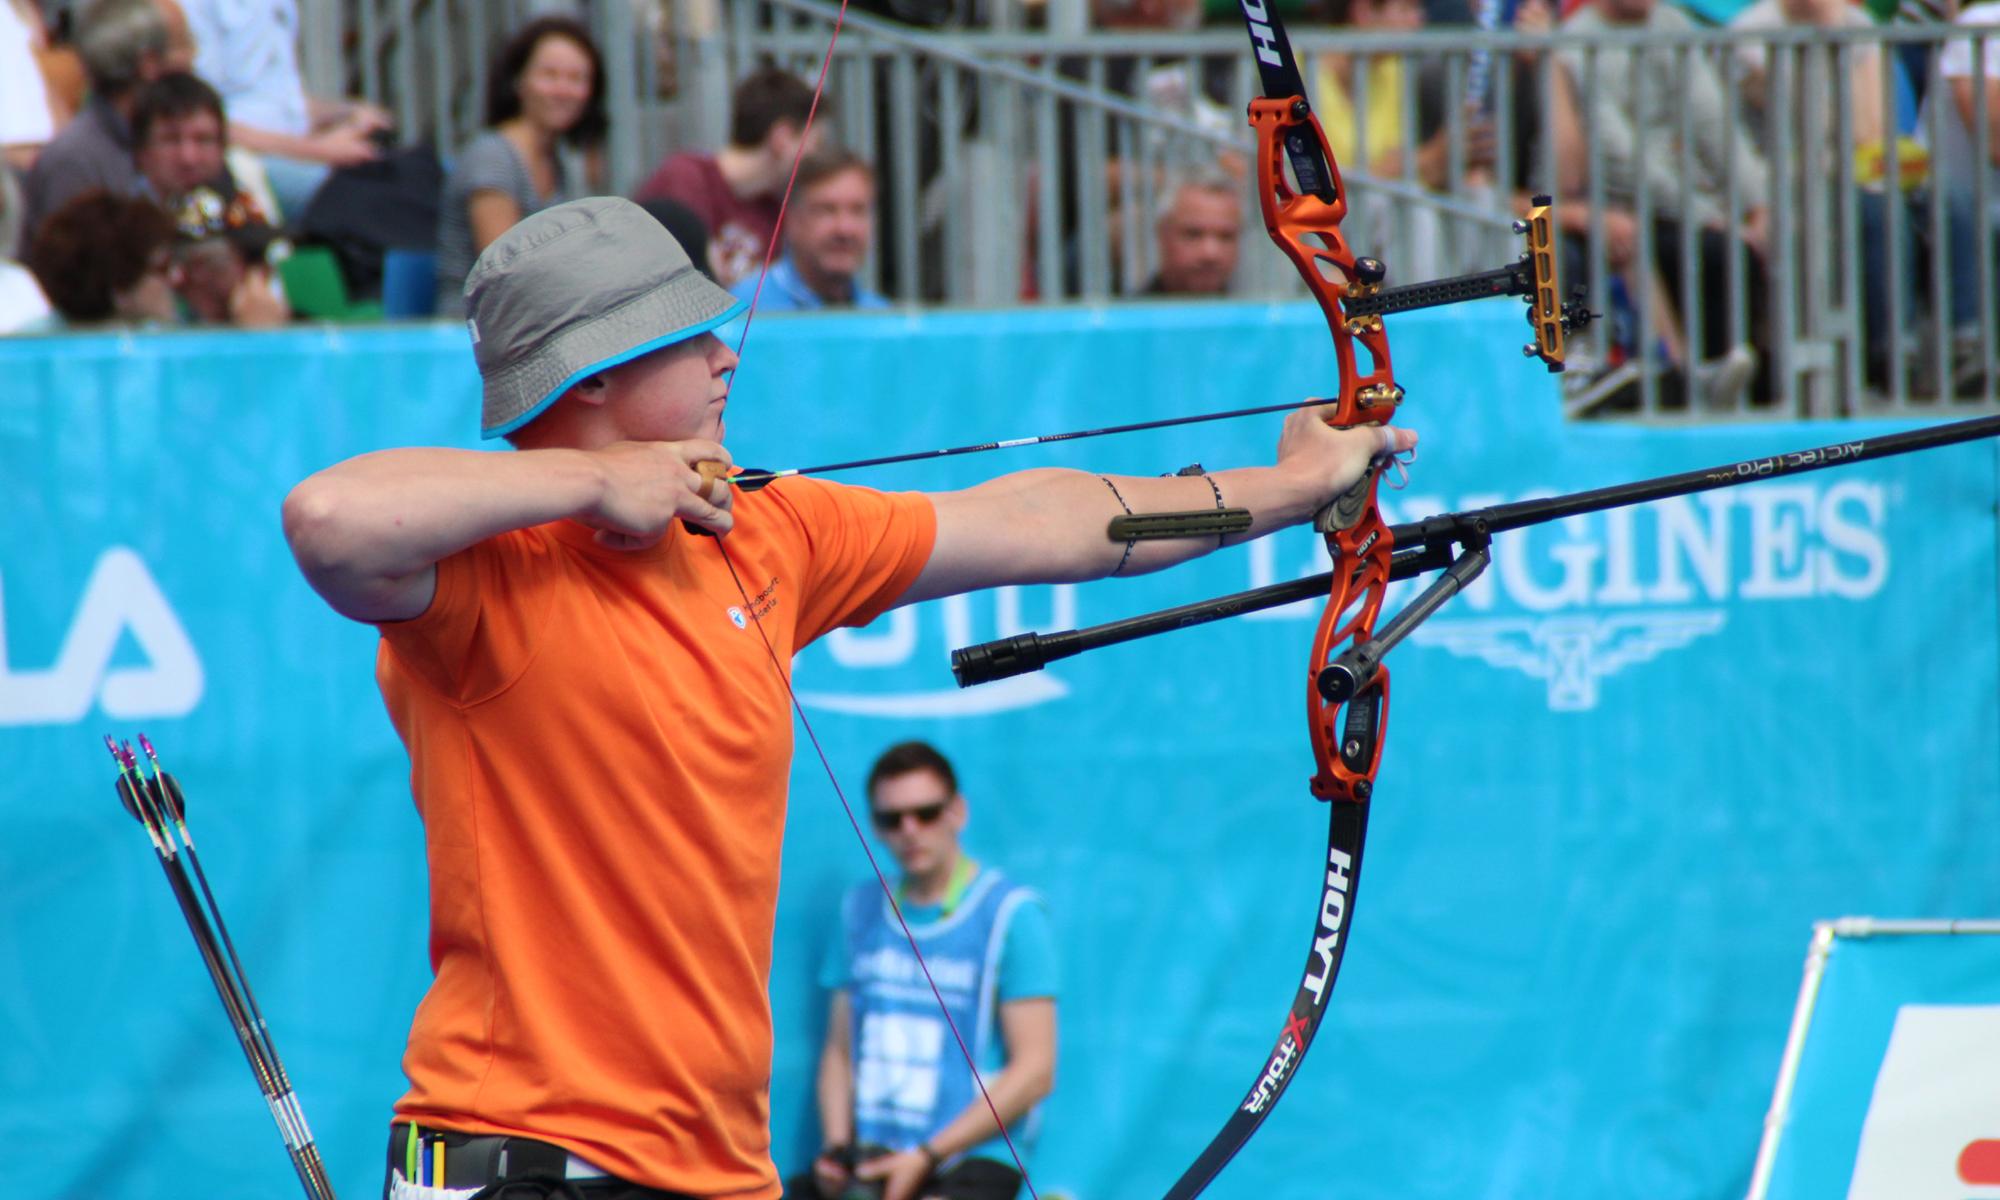 [ELEMENT Archery]